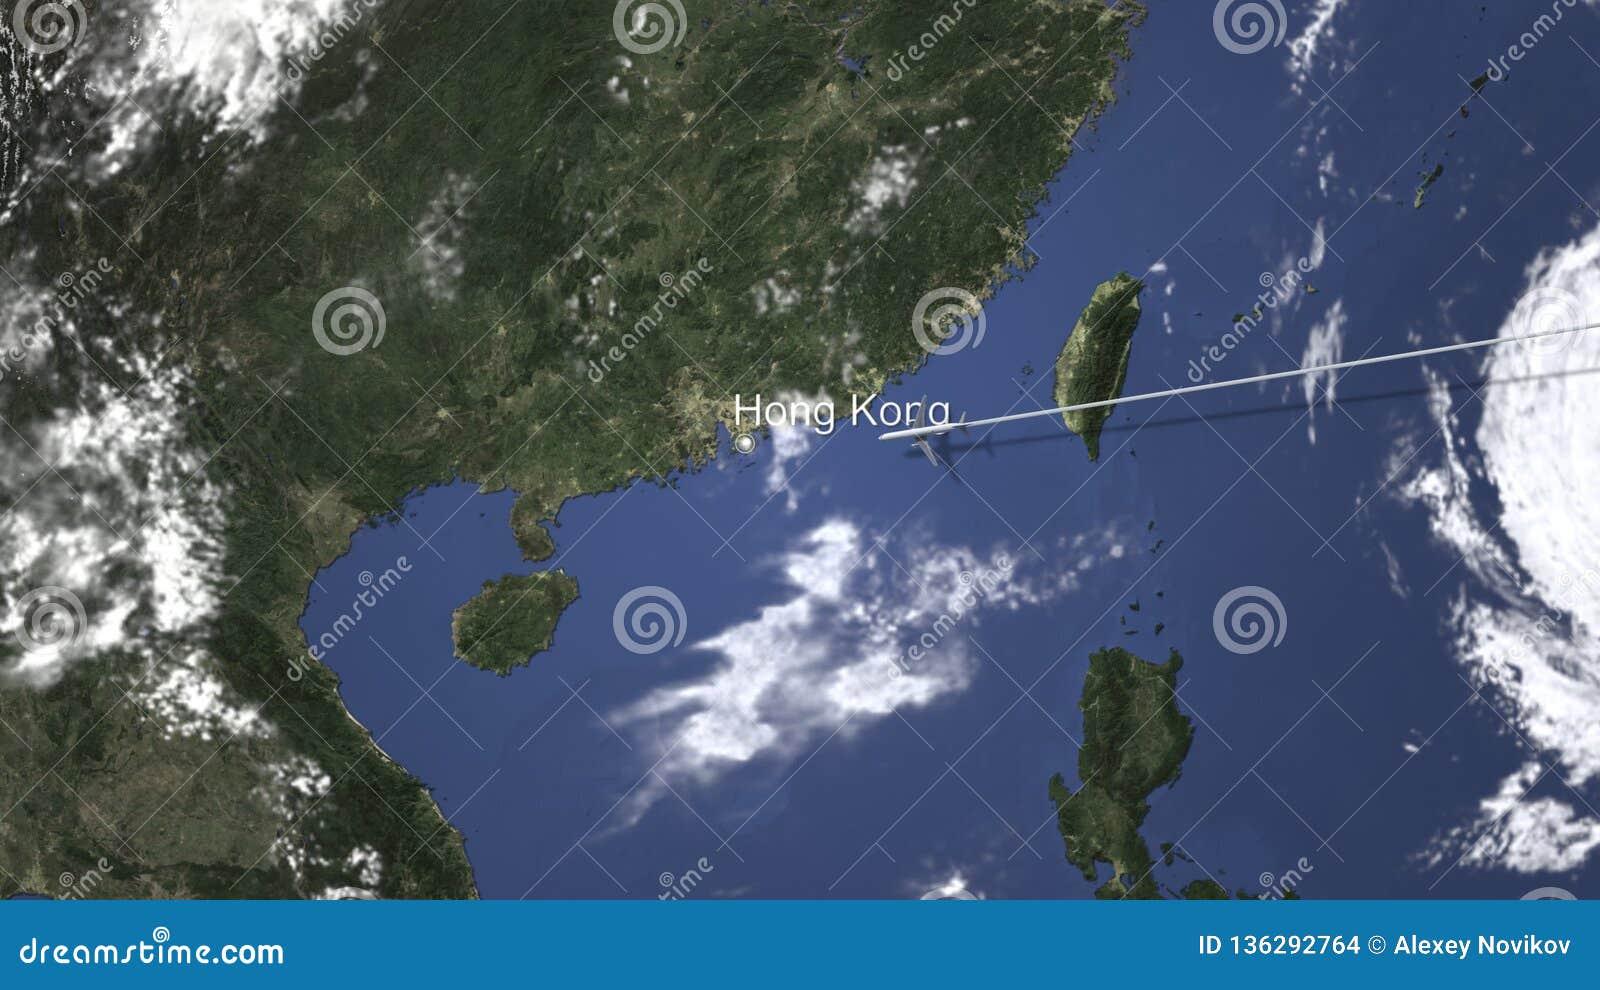 Kora Map World China on guitar map, ava map, katrina map, kobe map, kin map, korea map, uganda map, maya map,